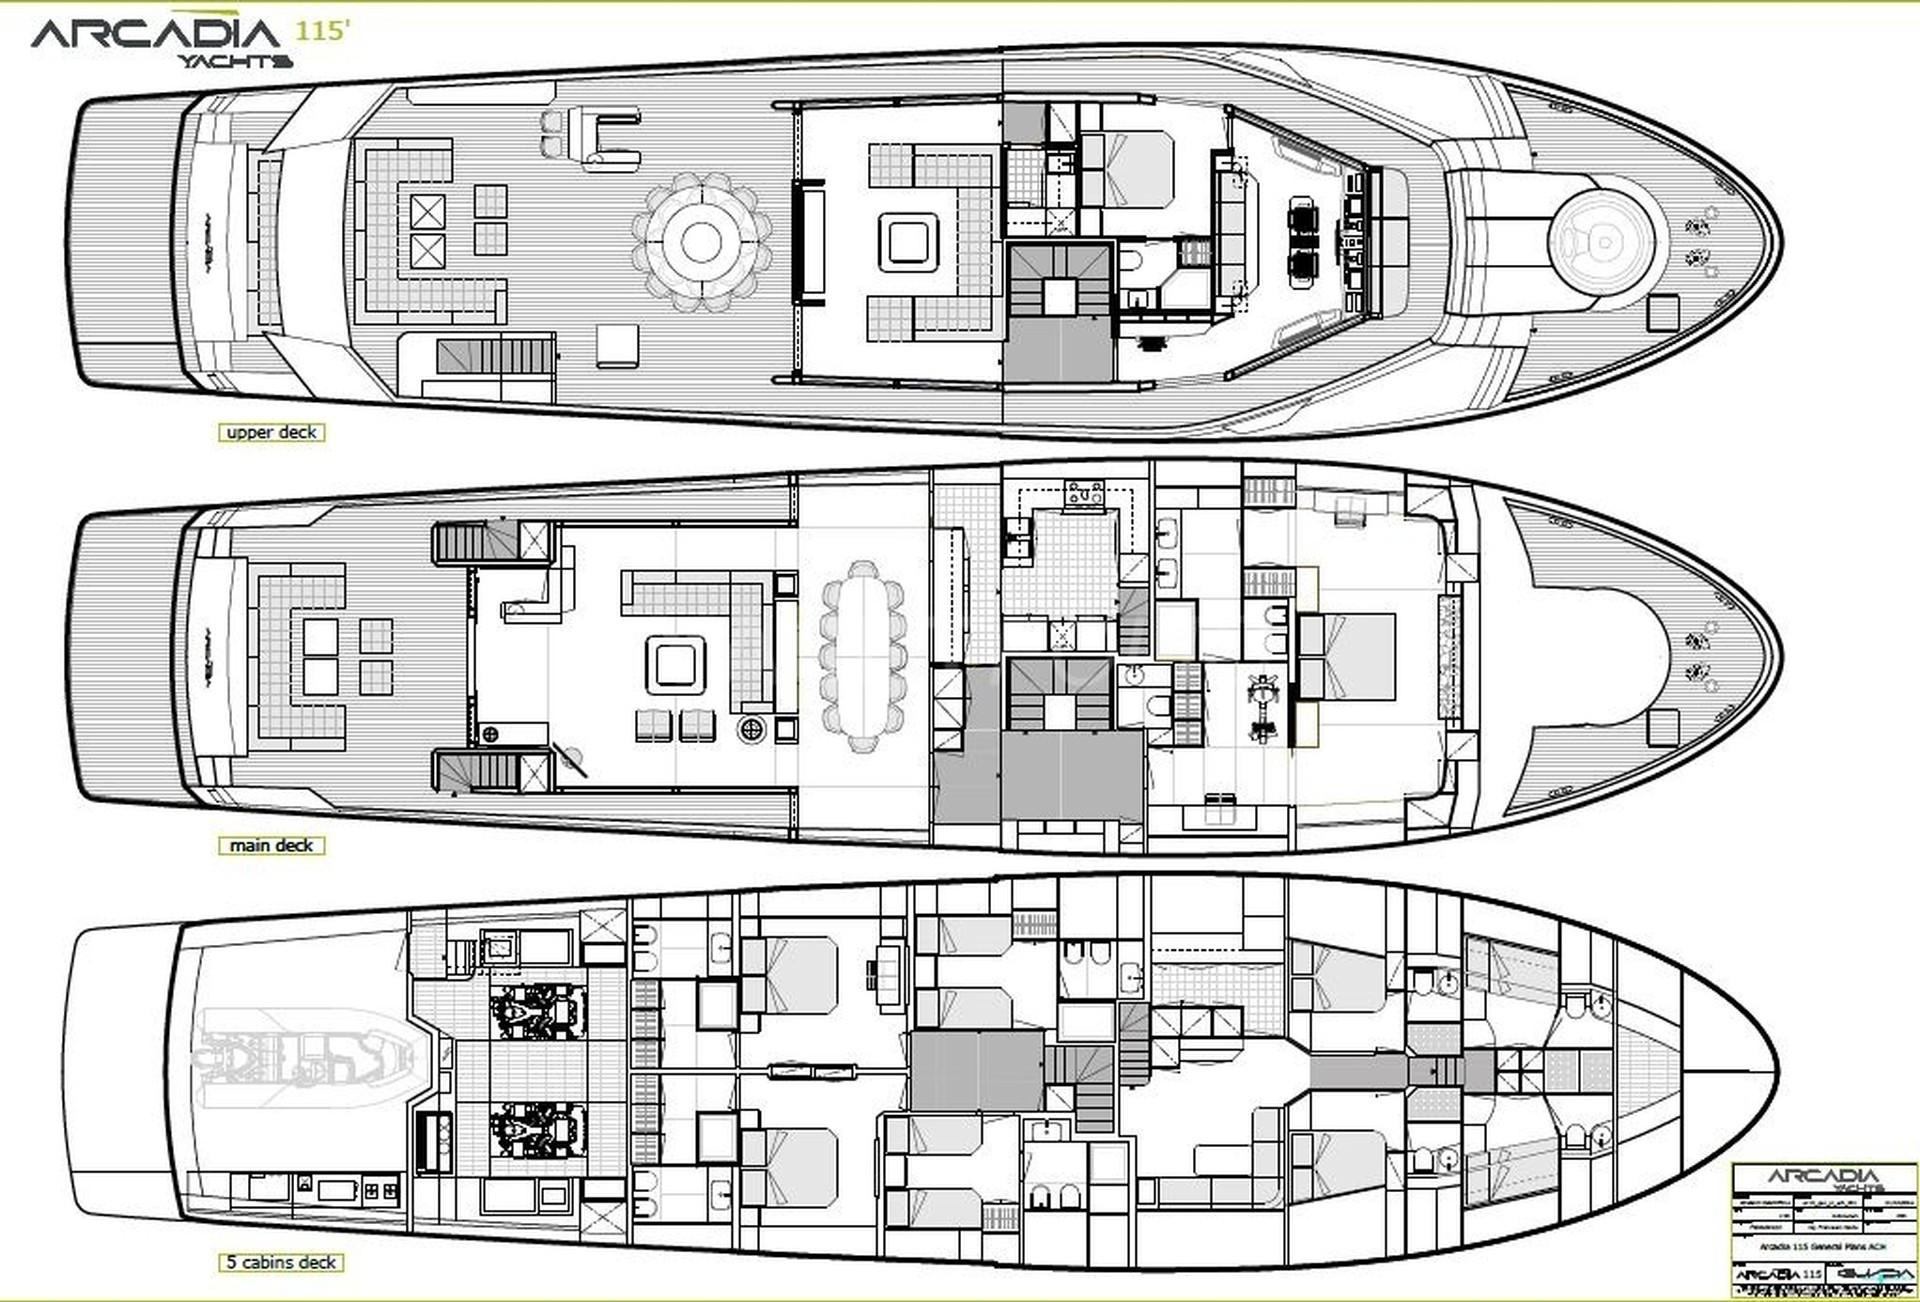 Layout Image Gallery Luxury Yacht Browser By Turbo Jet 115 Wiring Diagram 445 Williams Tender 2 X Jetskis Seadoo Gti Se155 Rya Training Center 1 Seabob